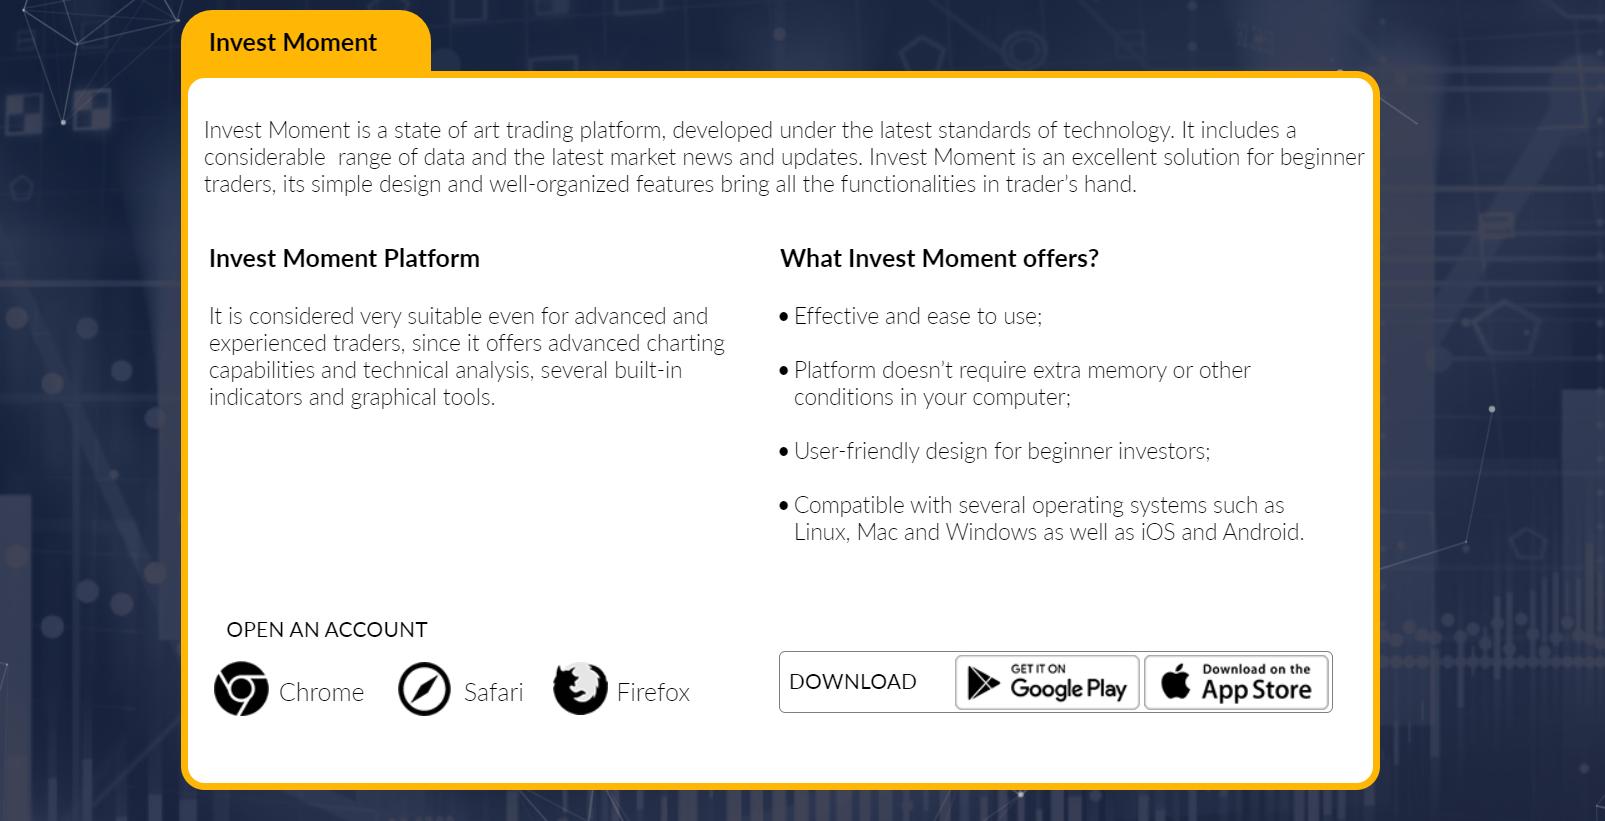 Обзор Invest Moment: компания и её сайт